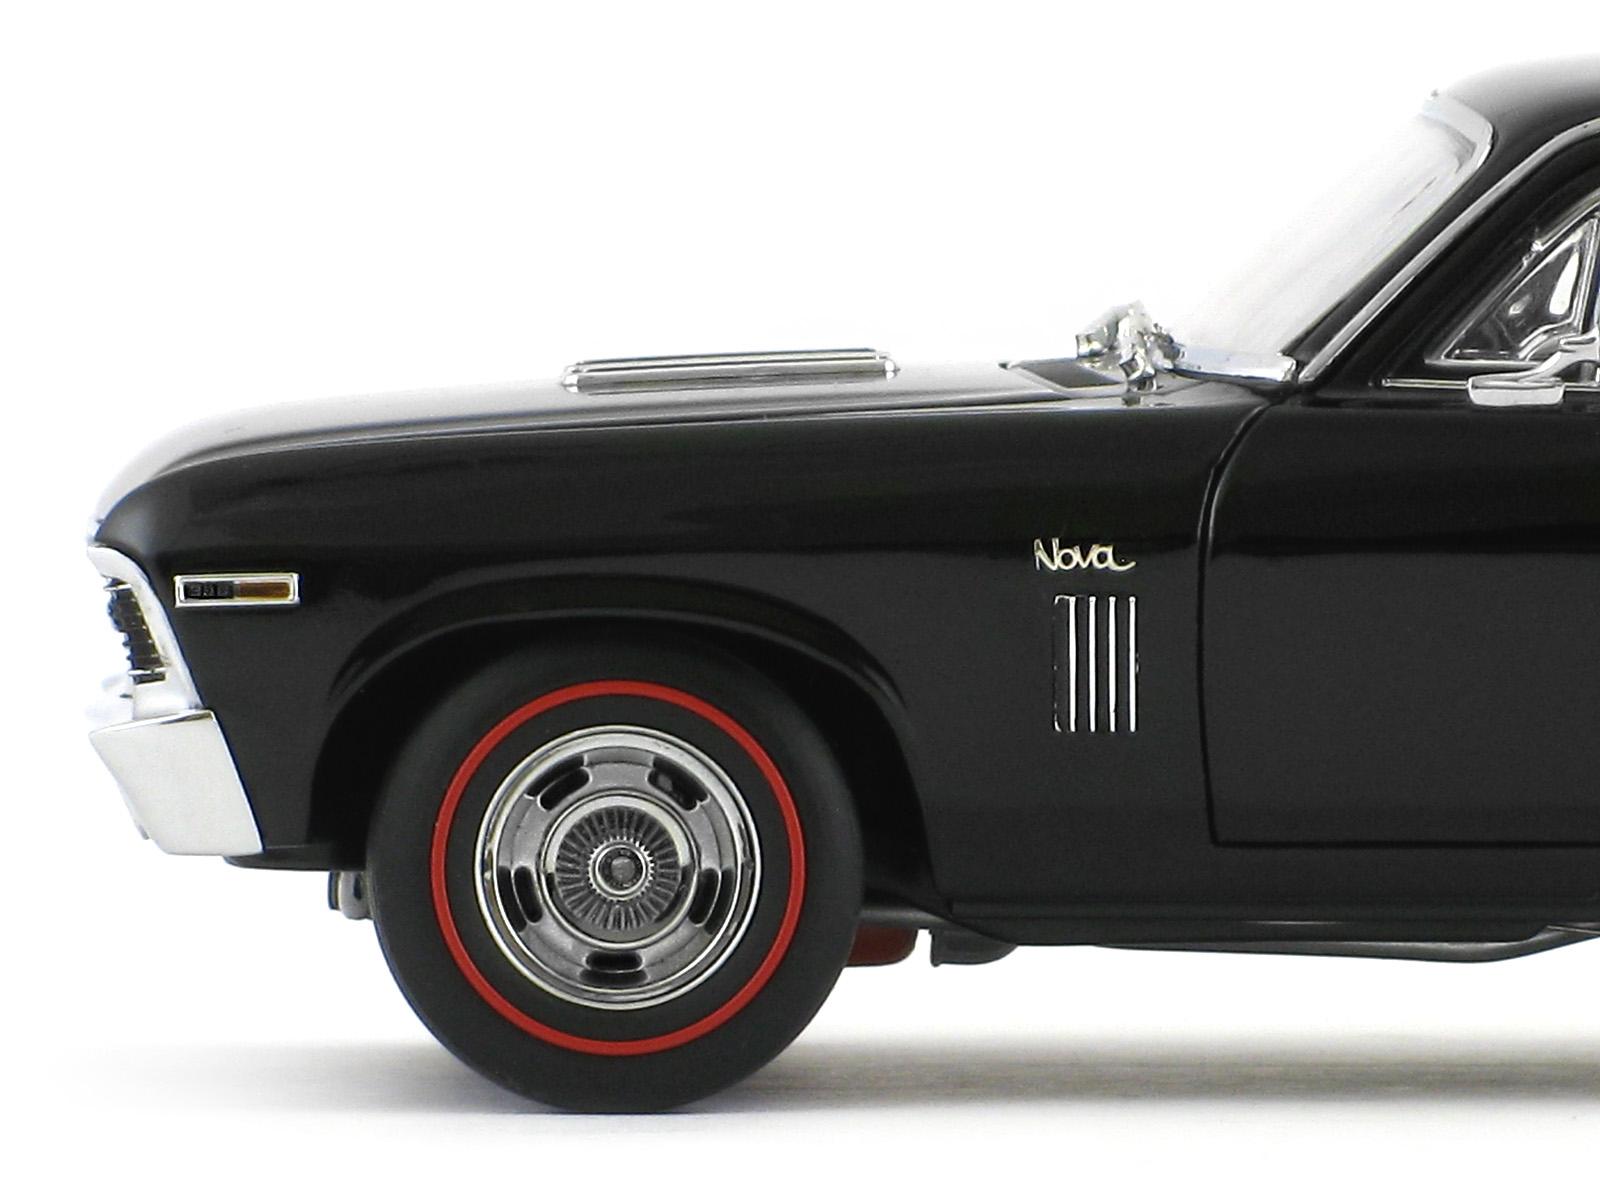 1969 chevrolet nova ss 396 danbury mint